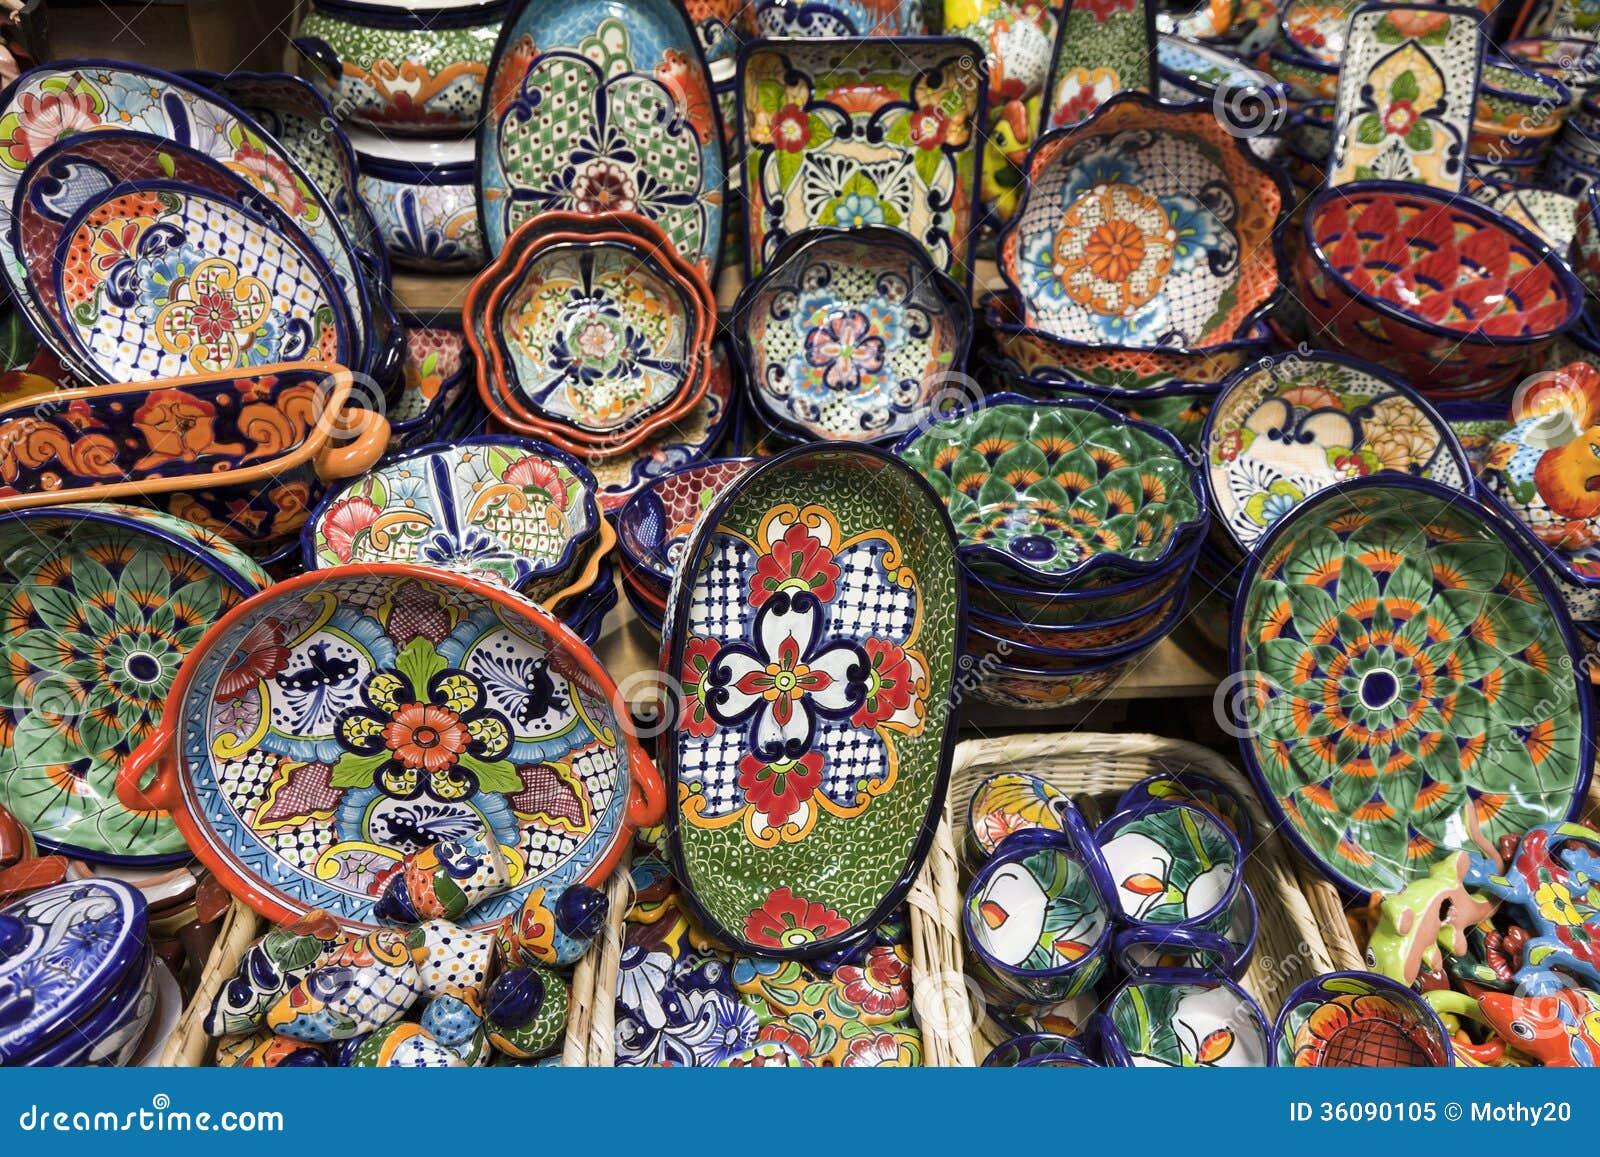 poterie en c ramique artisanale image stock image du color artistes 36090105. Black Bedroom Furniture Sets. Home Design Ideas